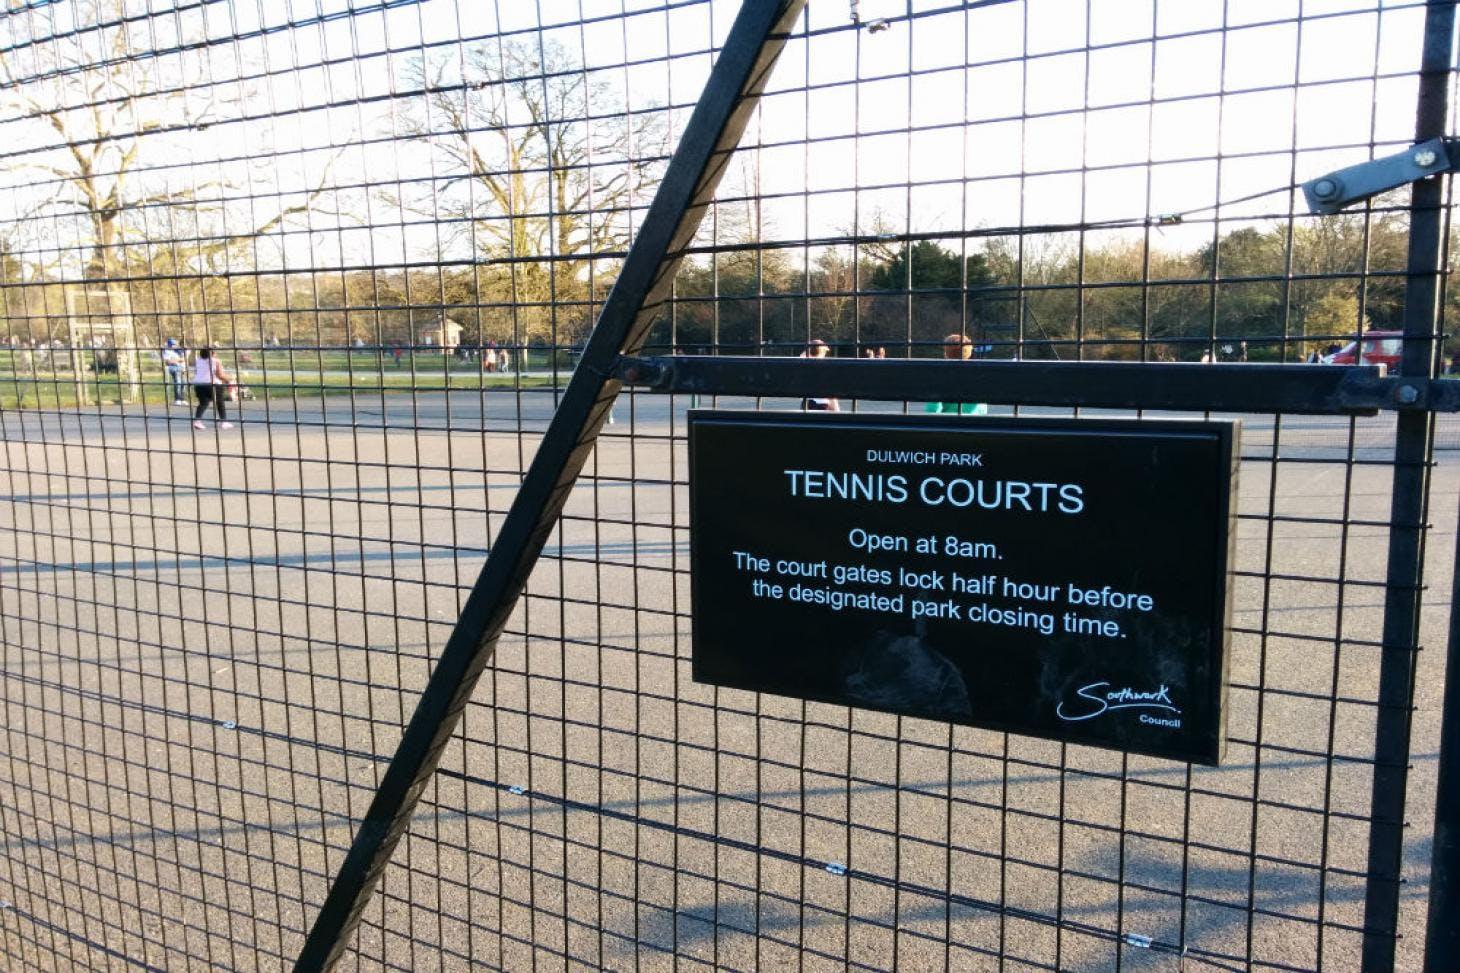 Dulwich Park Outdoor | Hard (macadam) tennis court